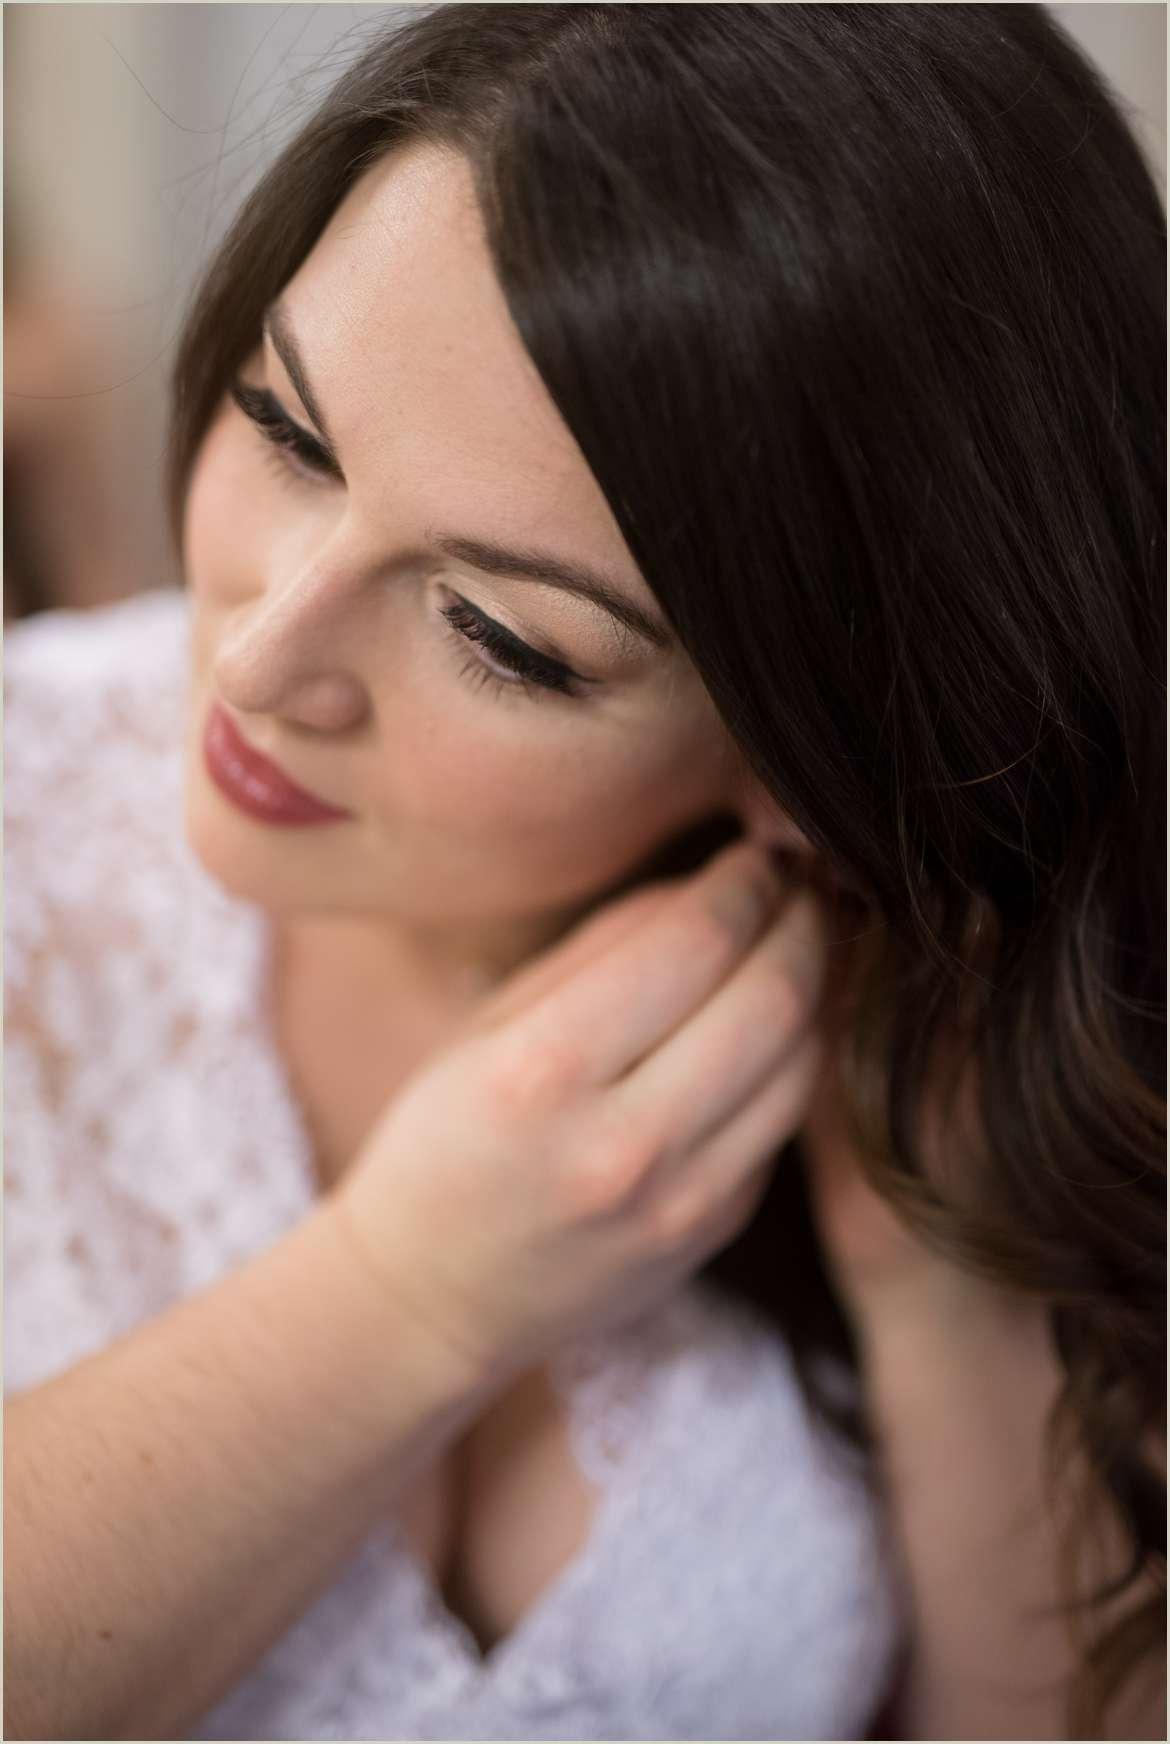 beautiful bride puts earrings in